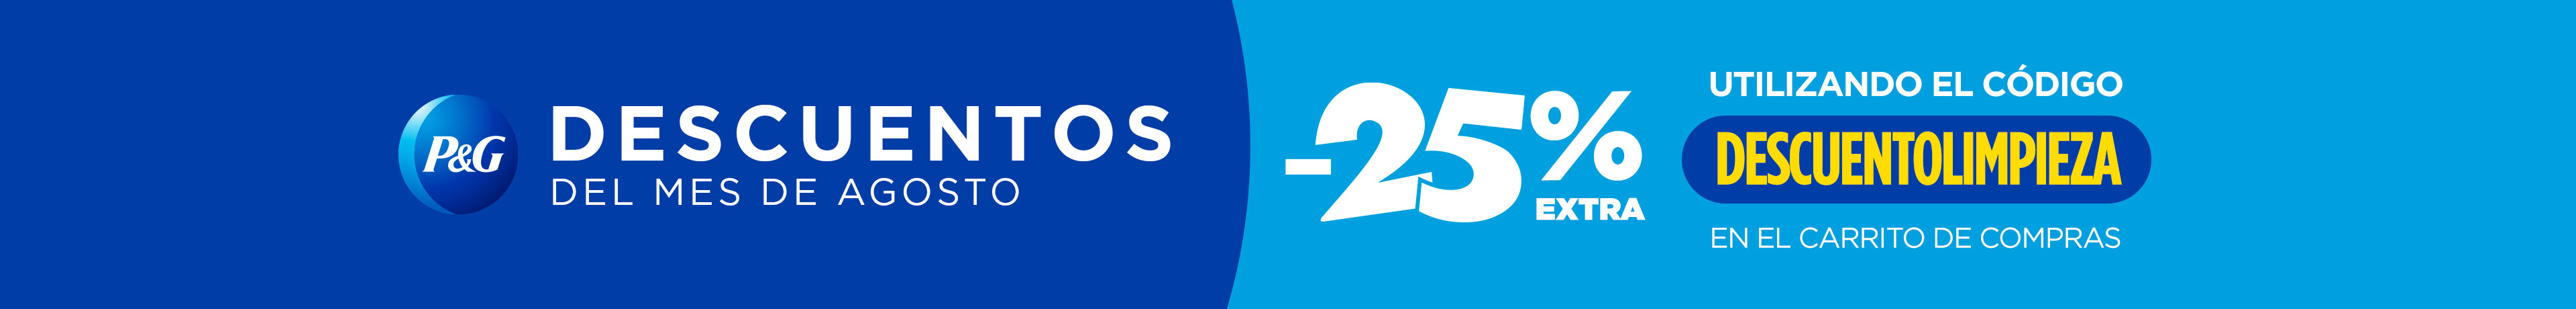 H:2387